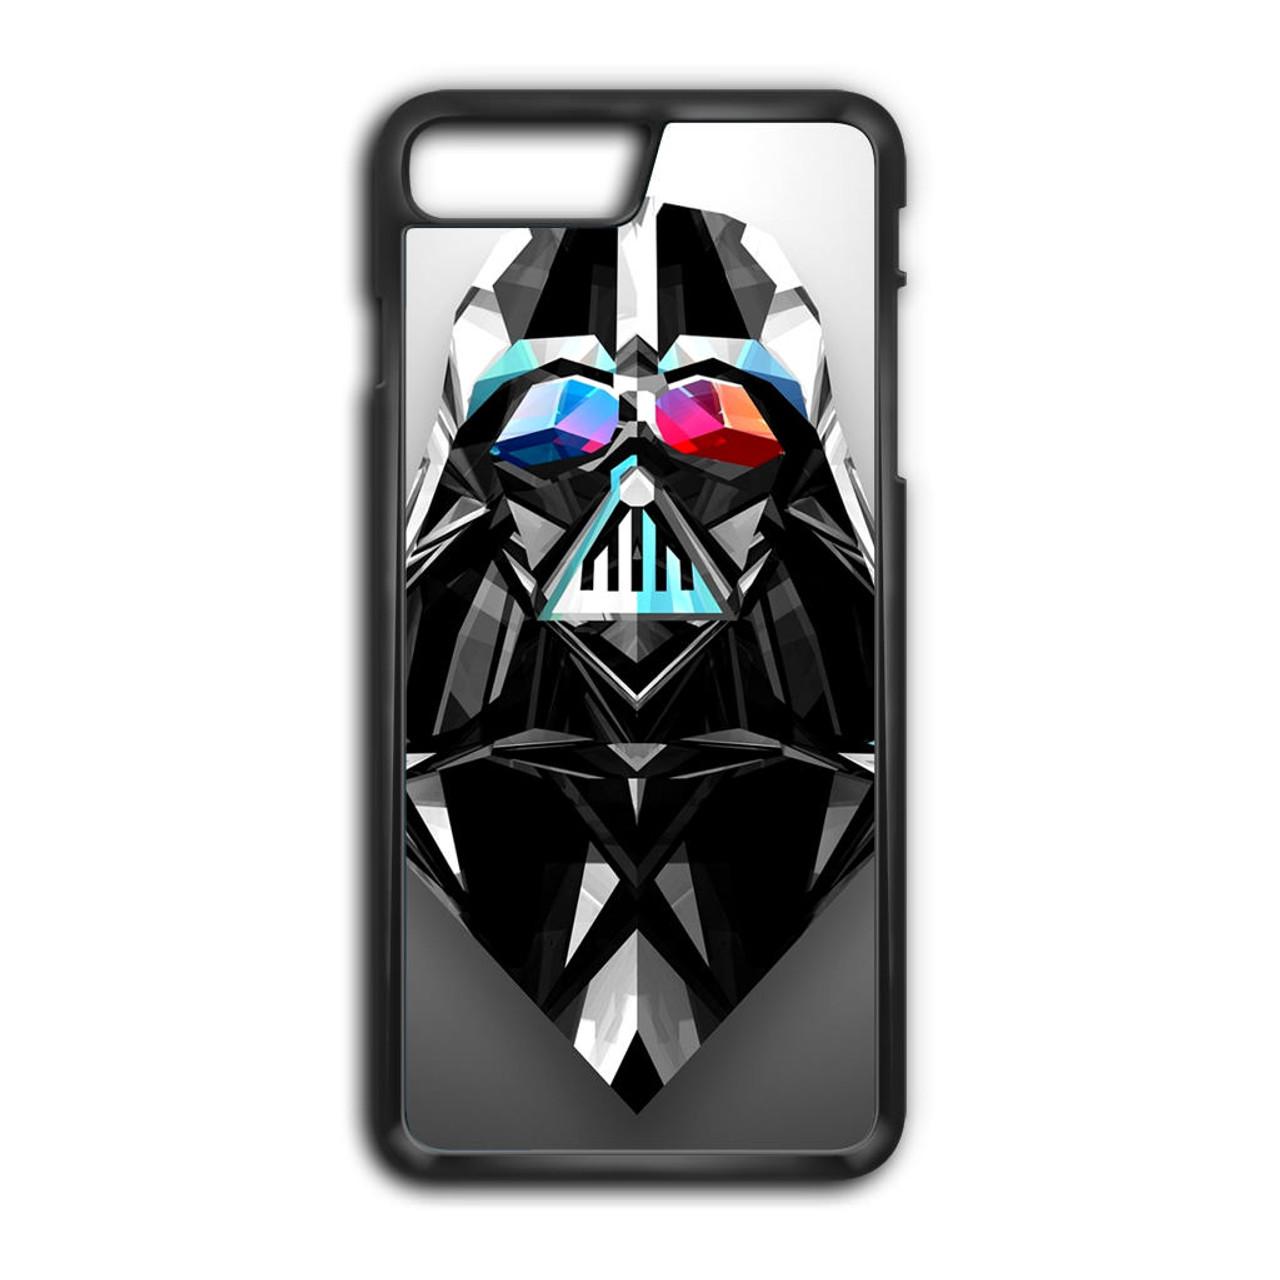 hot sale online 11819 fc70d Movie Starwars Darth Vader Artistic Geometric iPhone 7 Plus Case